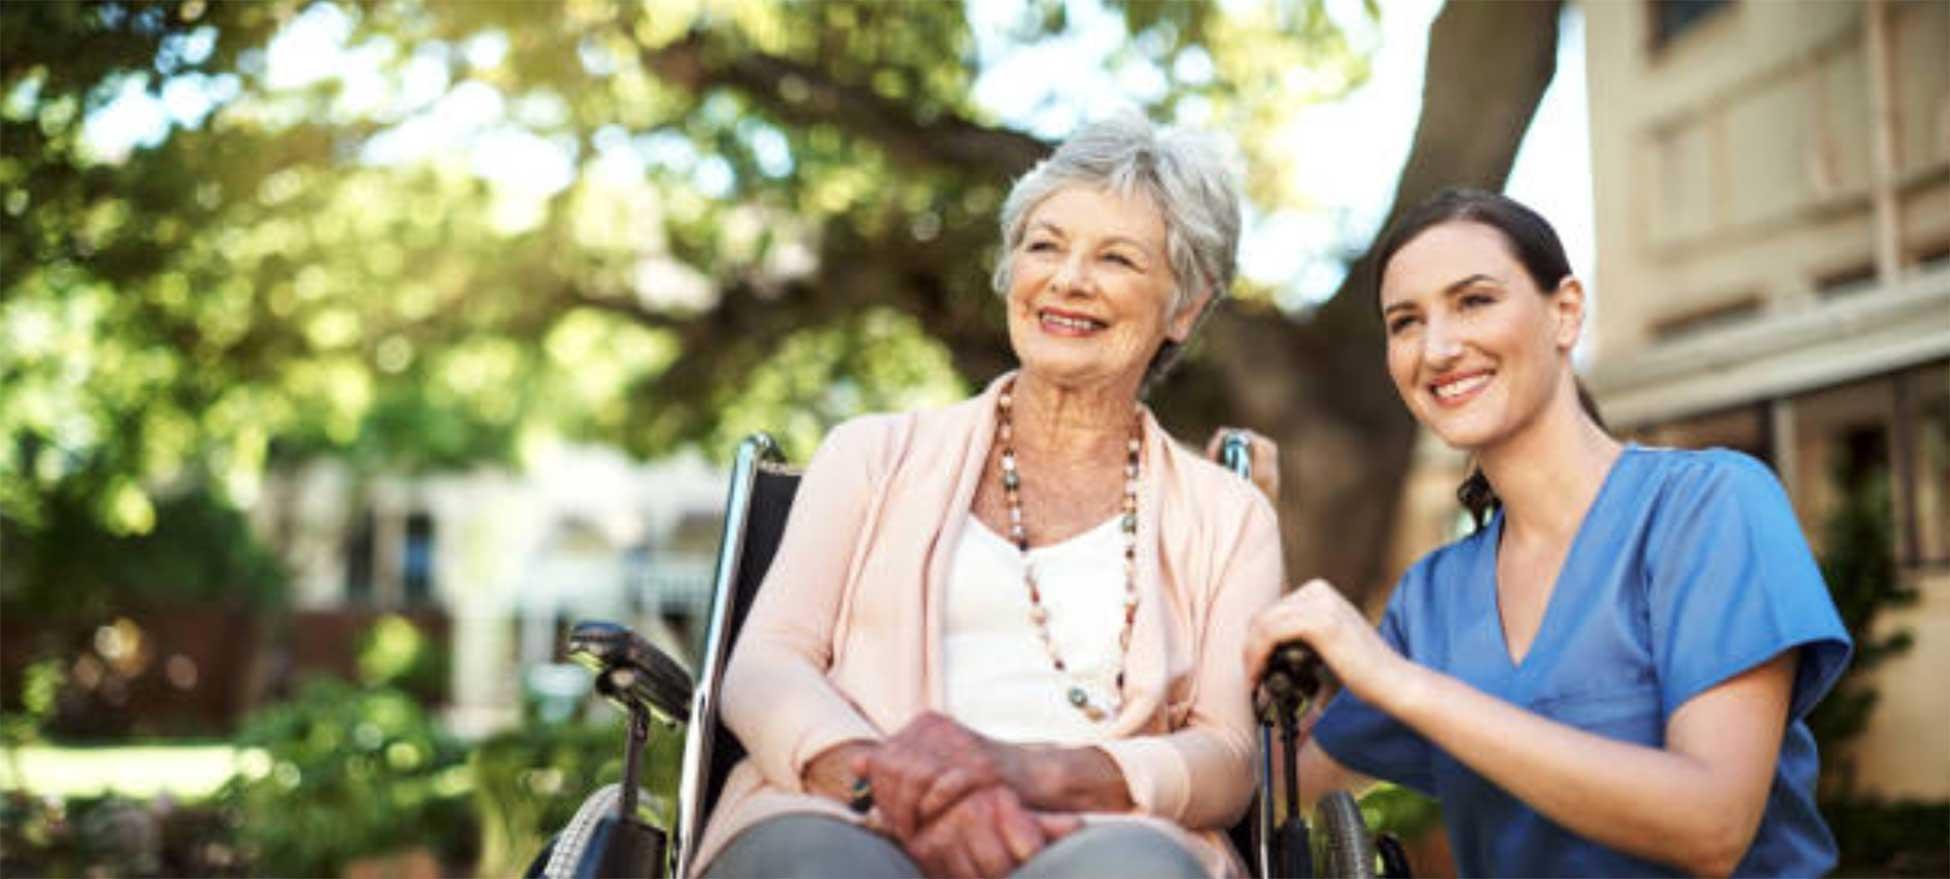 rsa - residenza sanitaria per anziani